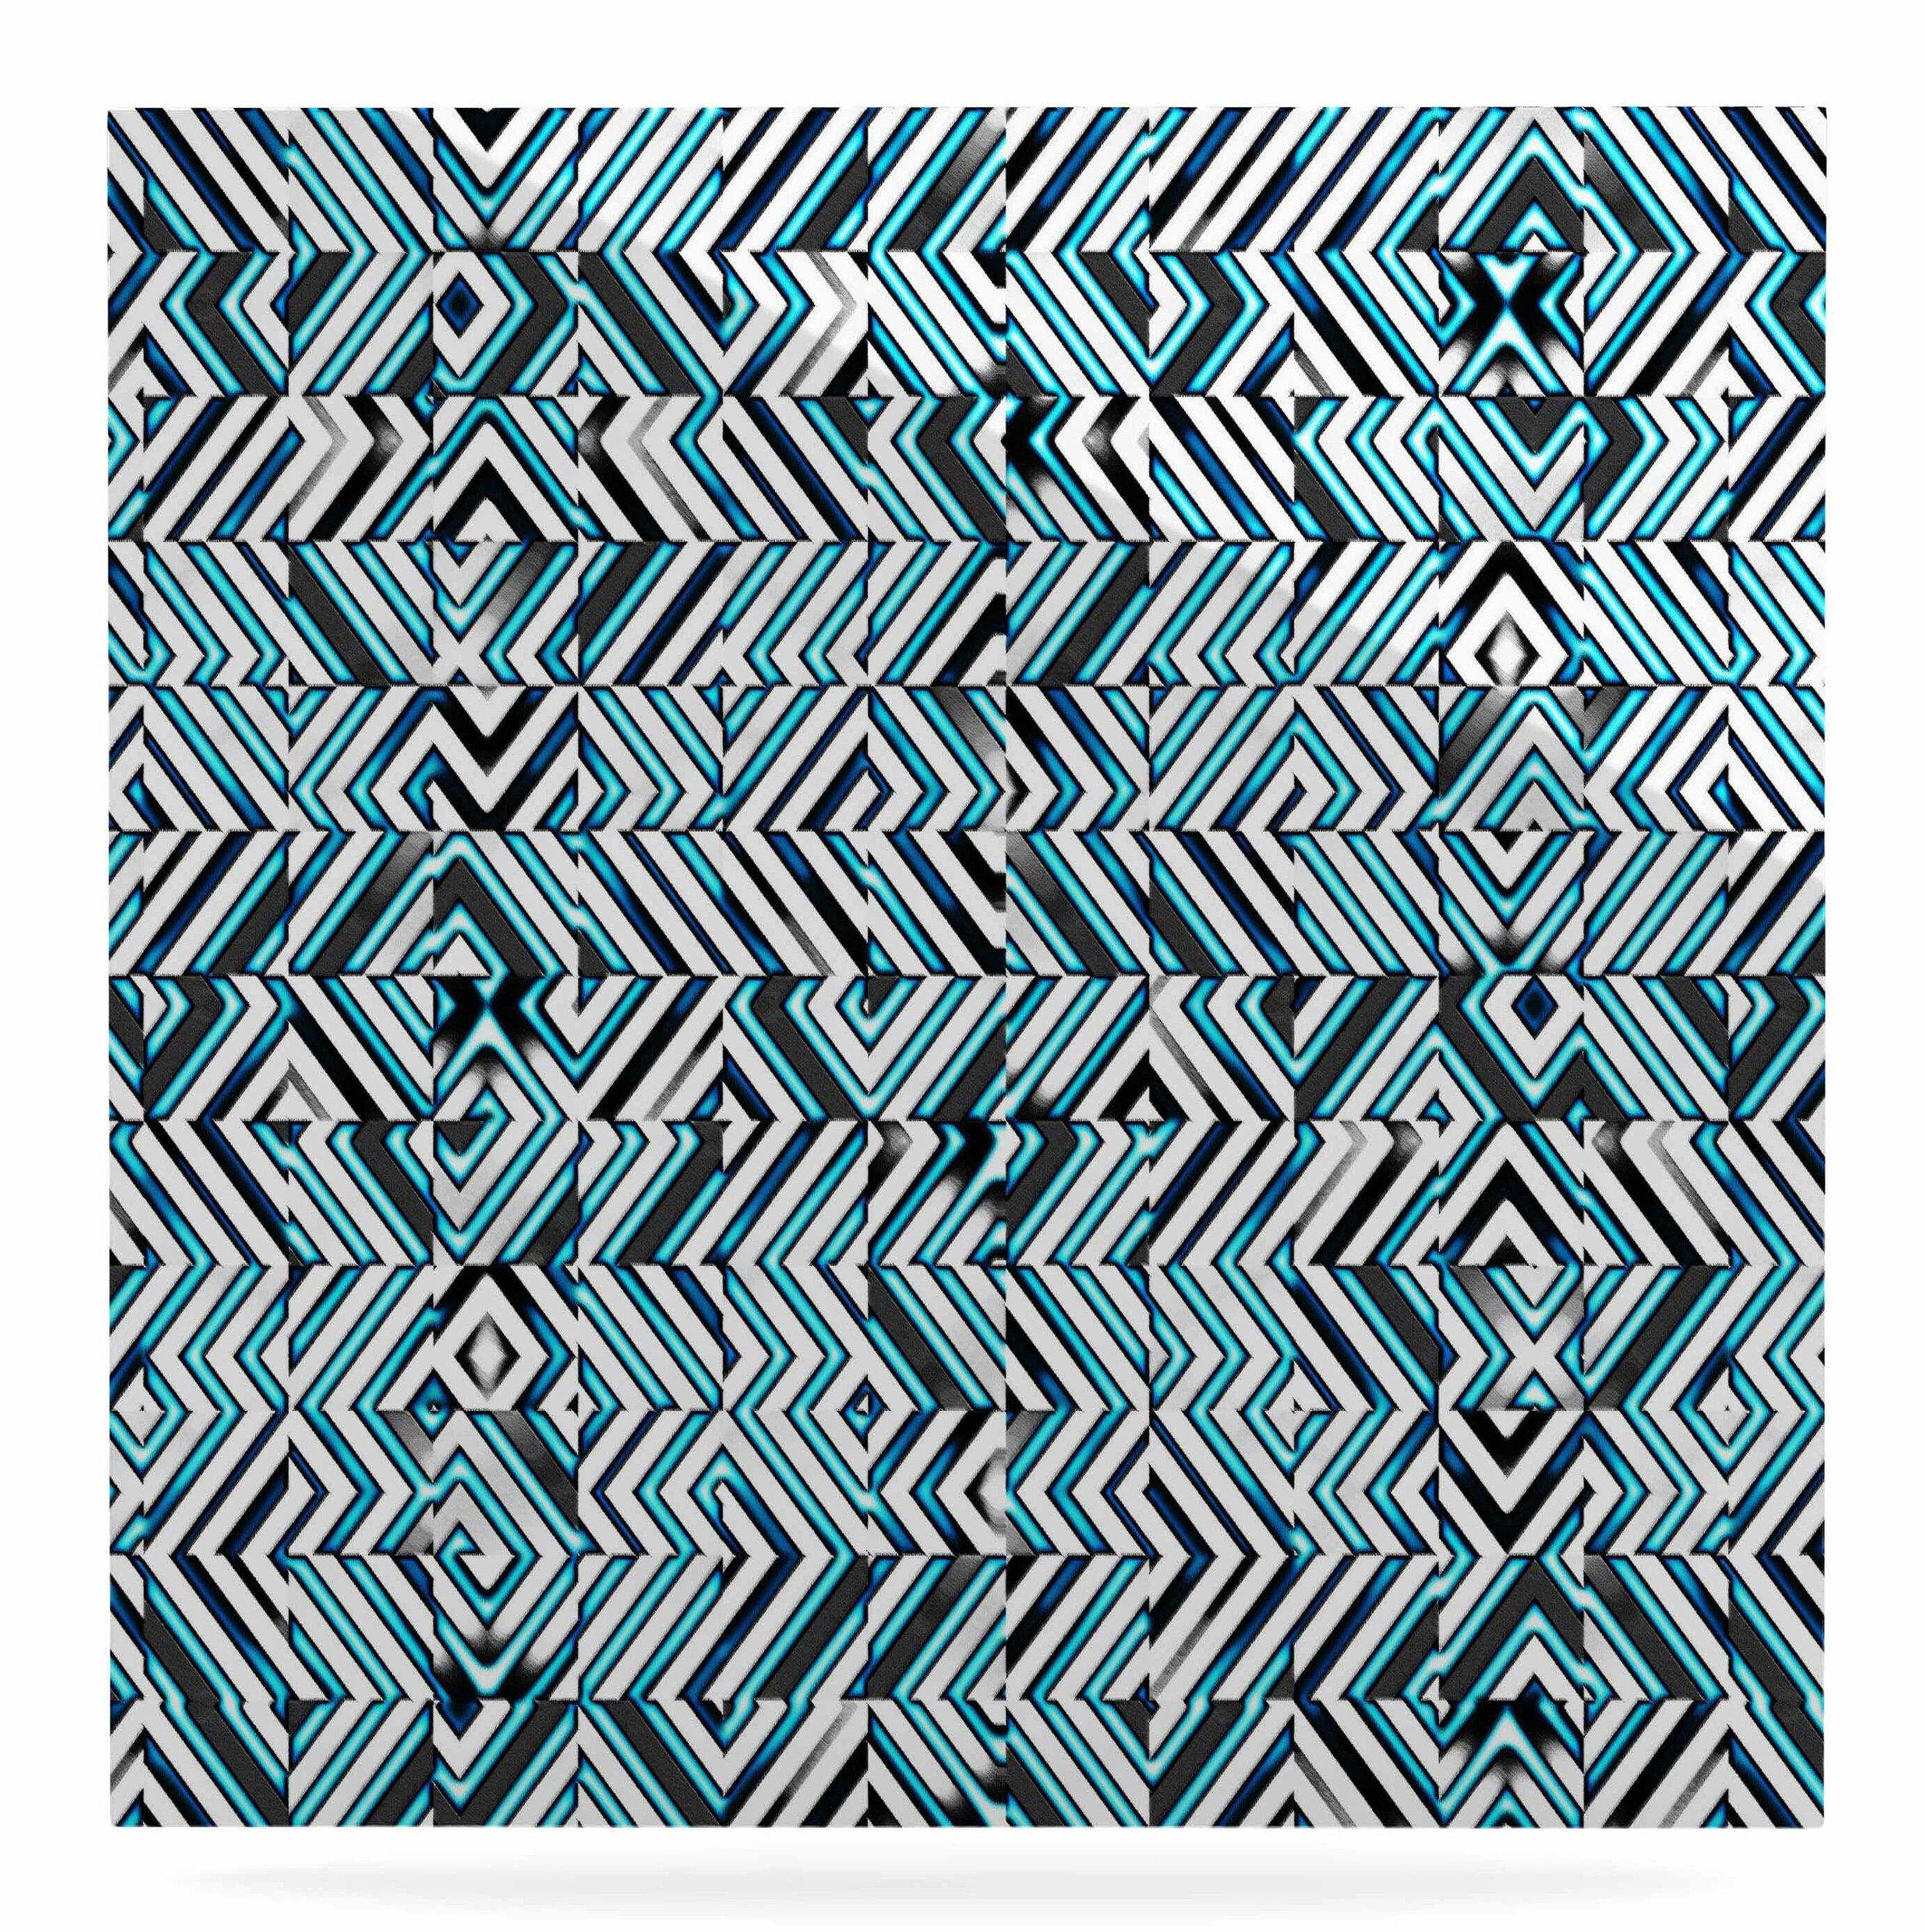 East Urban Home \'Maze Geometric Abstract 2\' Graphic Art Print on ...